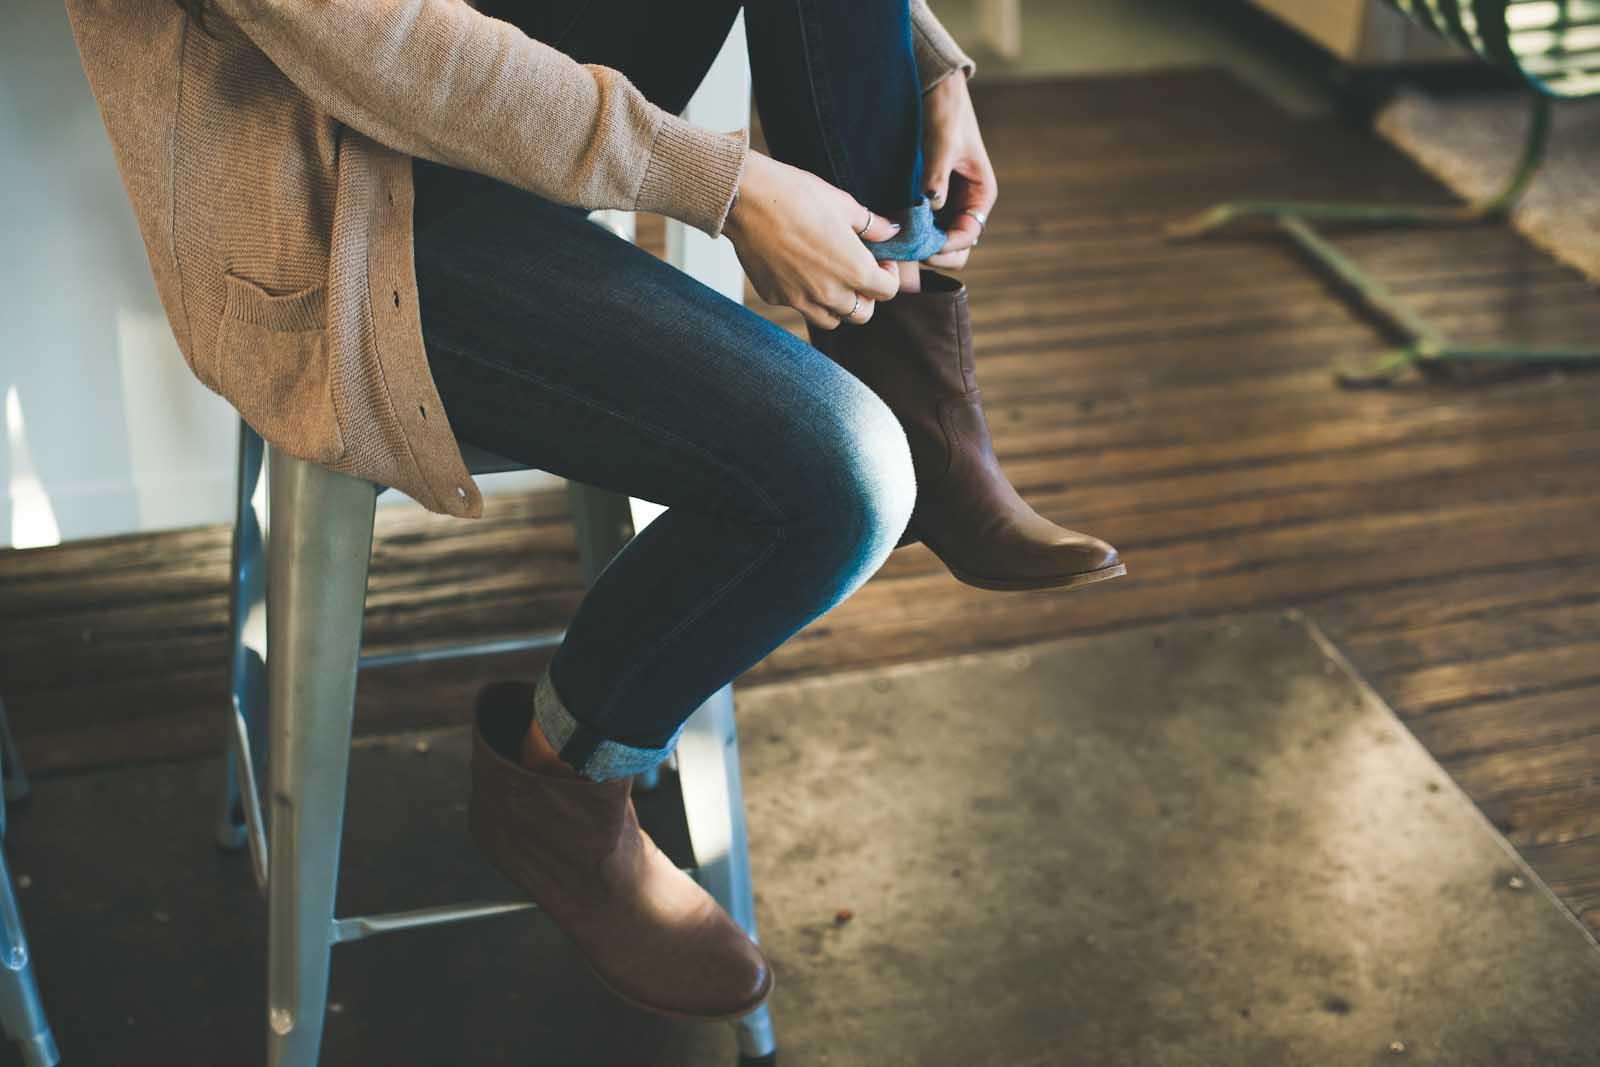 Girl on stool | YWAM Sydney, Newtown | Australia